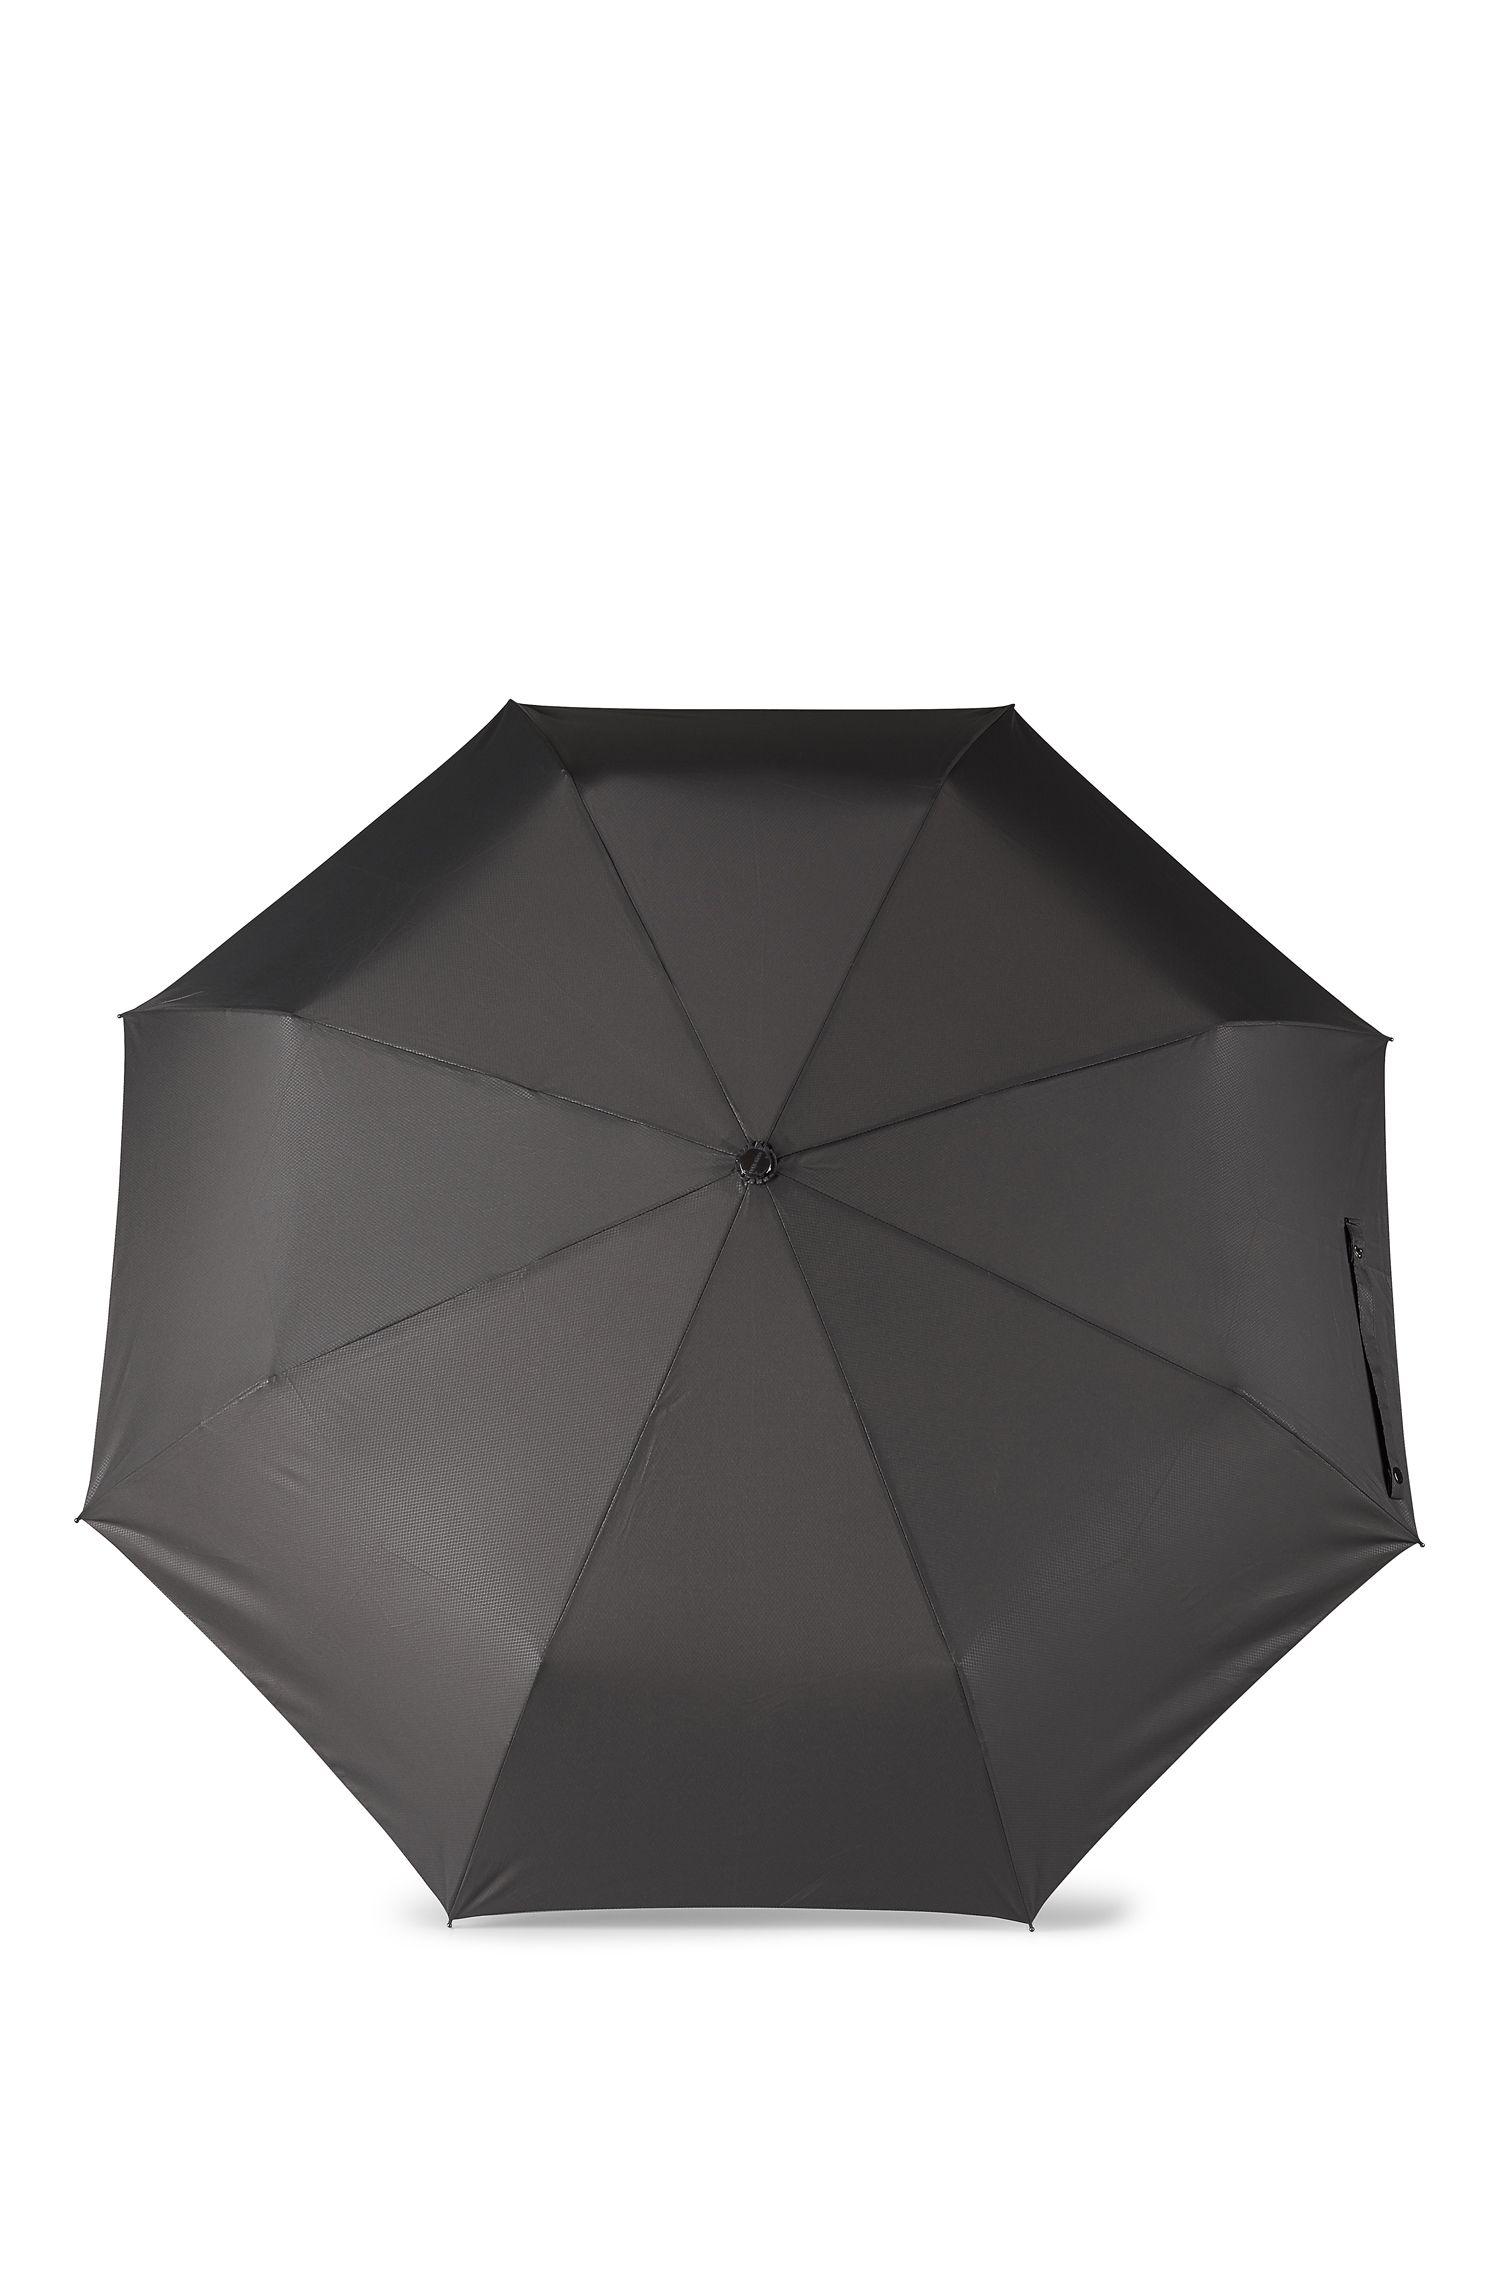 Aluminum Frame Patterned Pocket Umbrella | Umbrella New Loop Dark